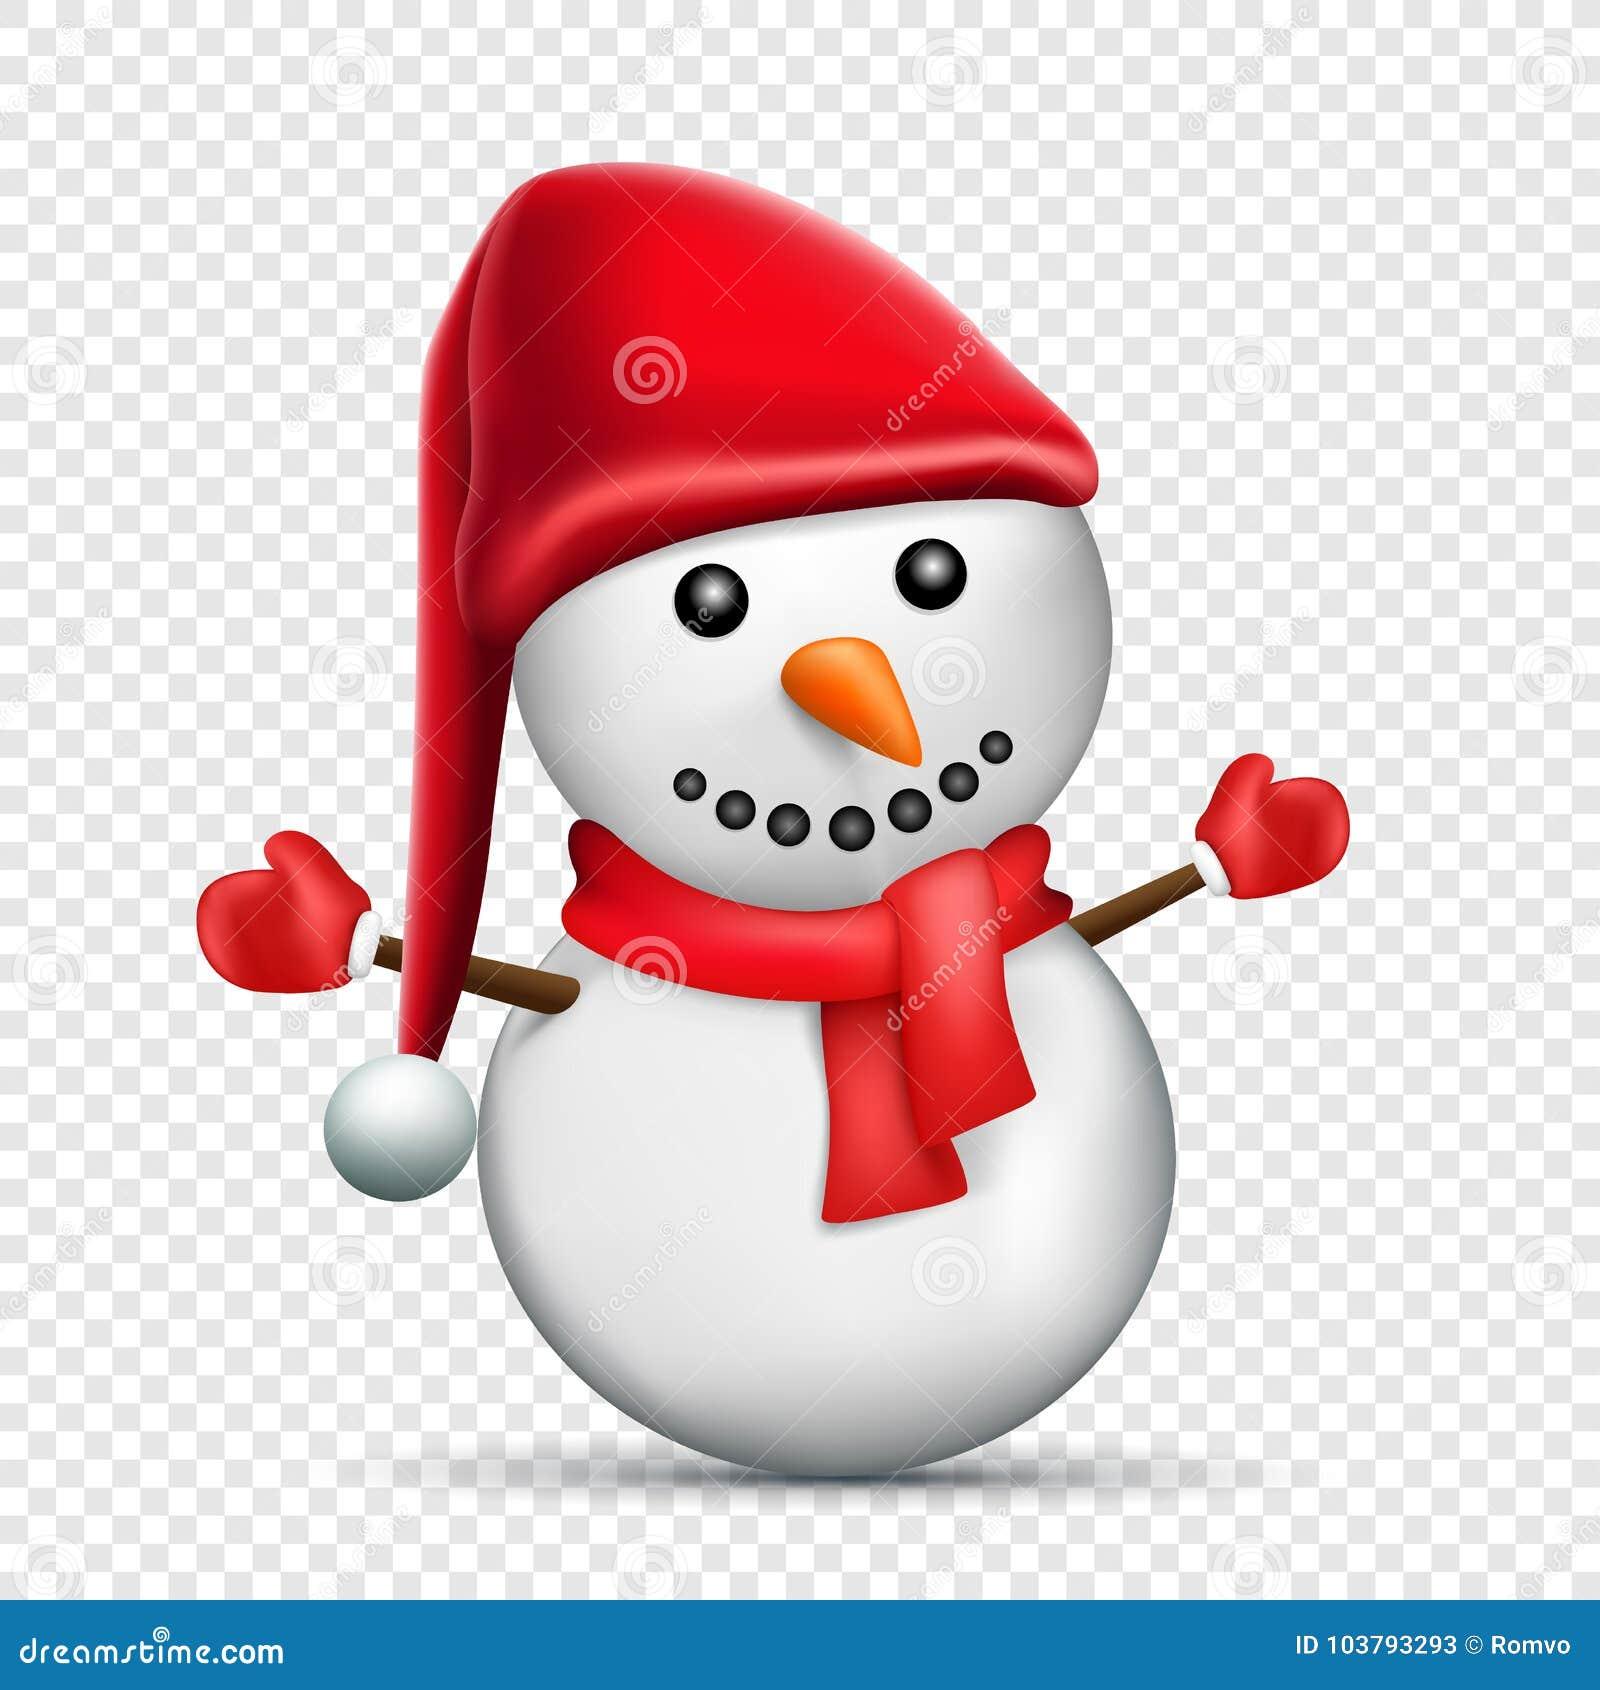 Christmas Hat Cartoon Transparent.Snowman Transparent Background Stock Vector Illustration